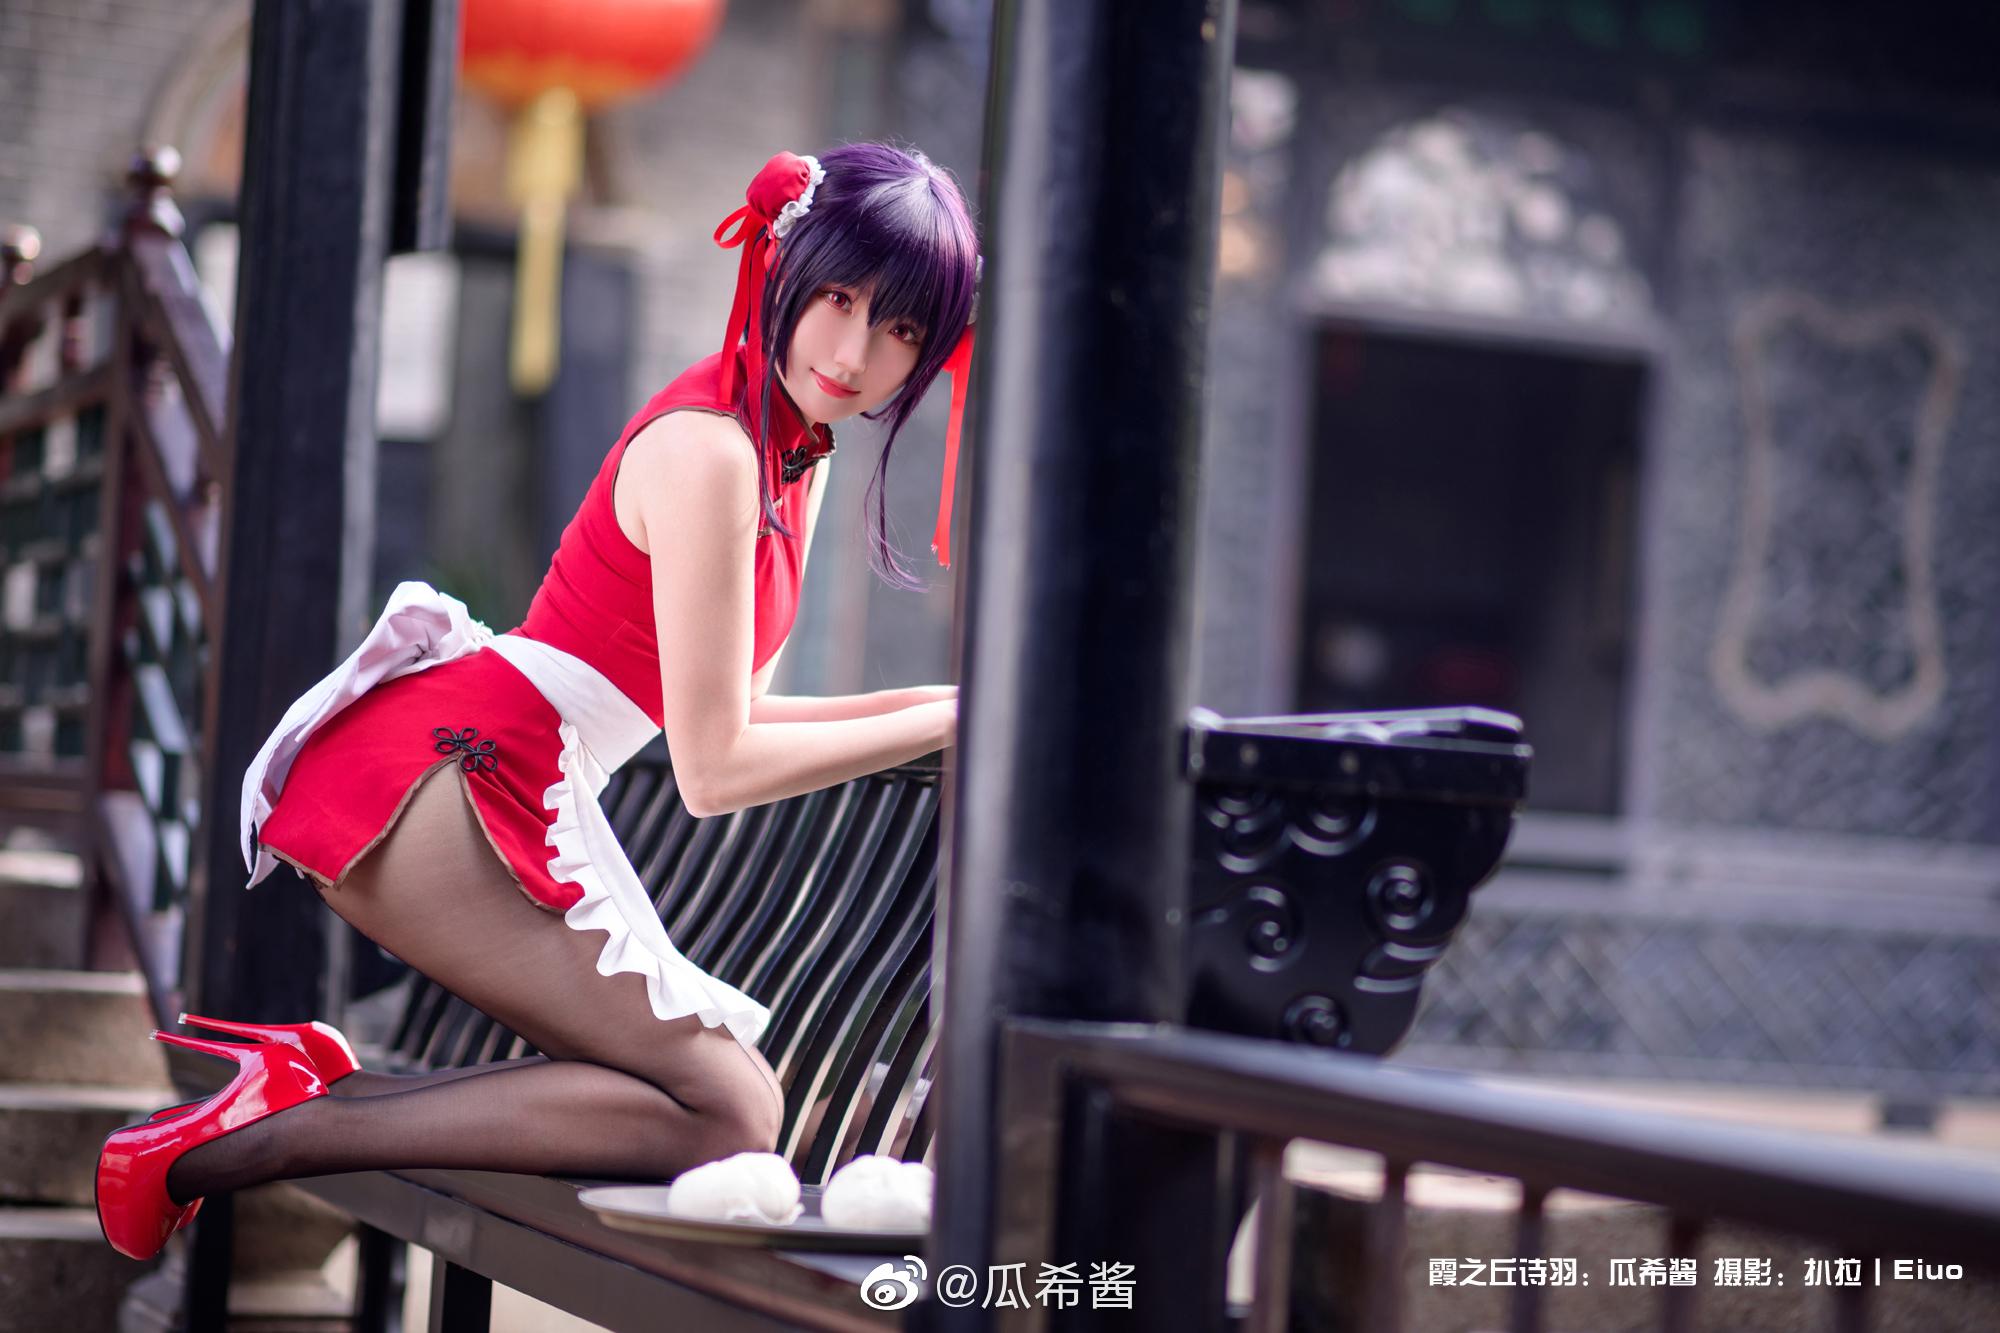 霞之丘诗羽旗袍cosplay Cosplay-第9张